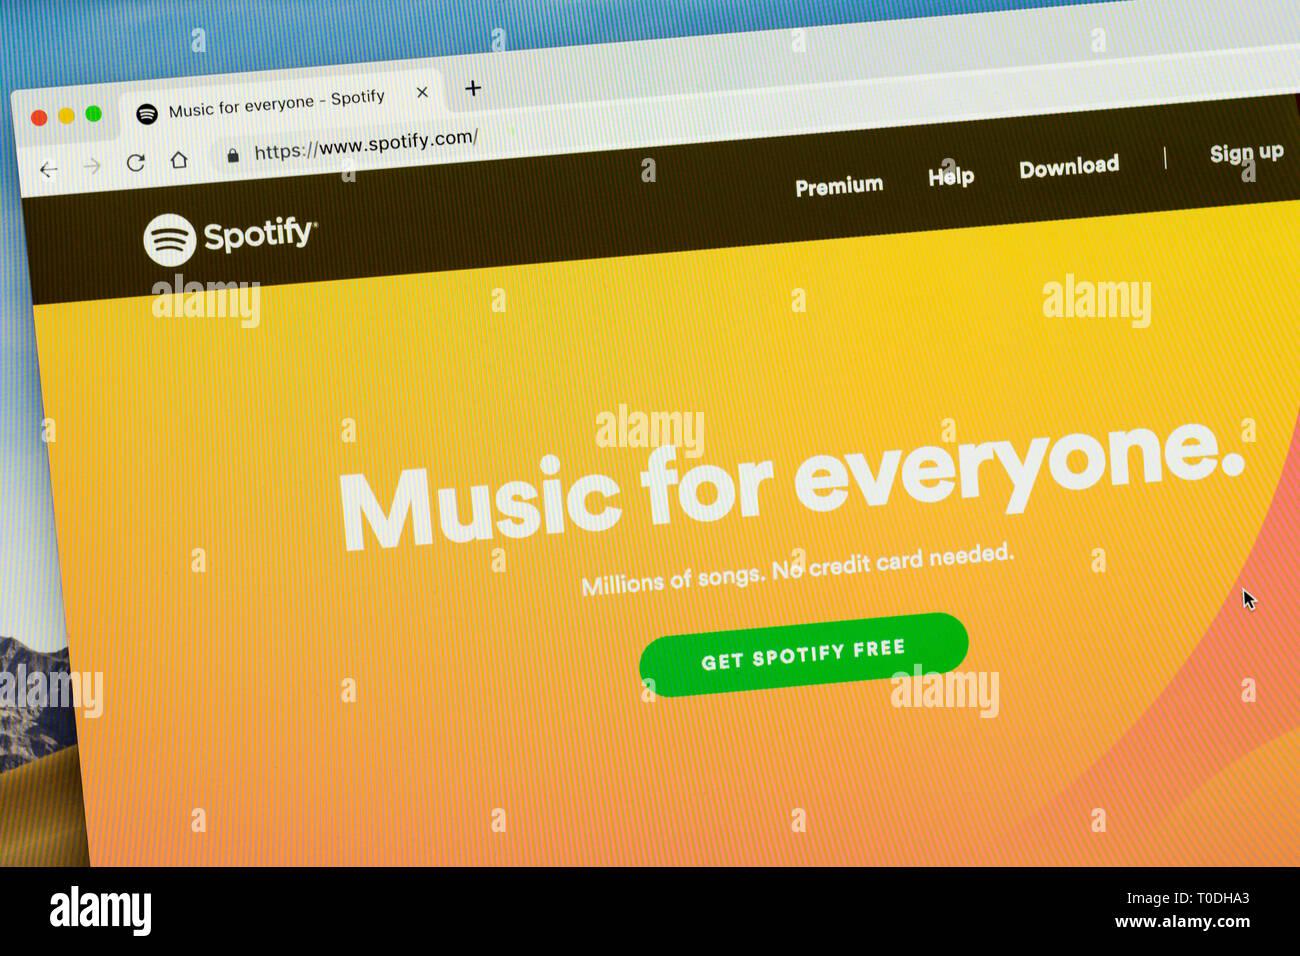 Spotify homepage in desktop computer browser - Stock Image